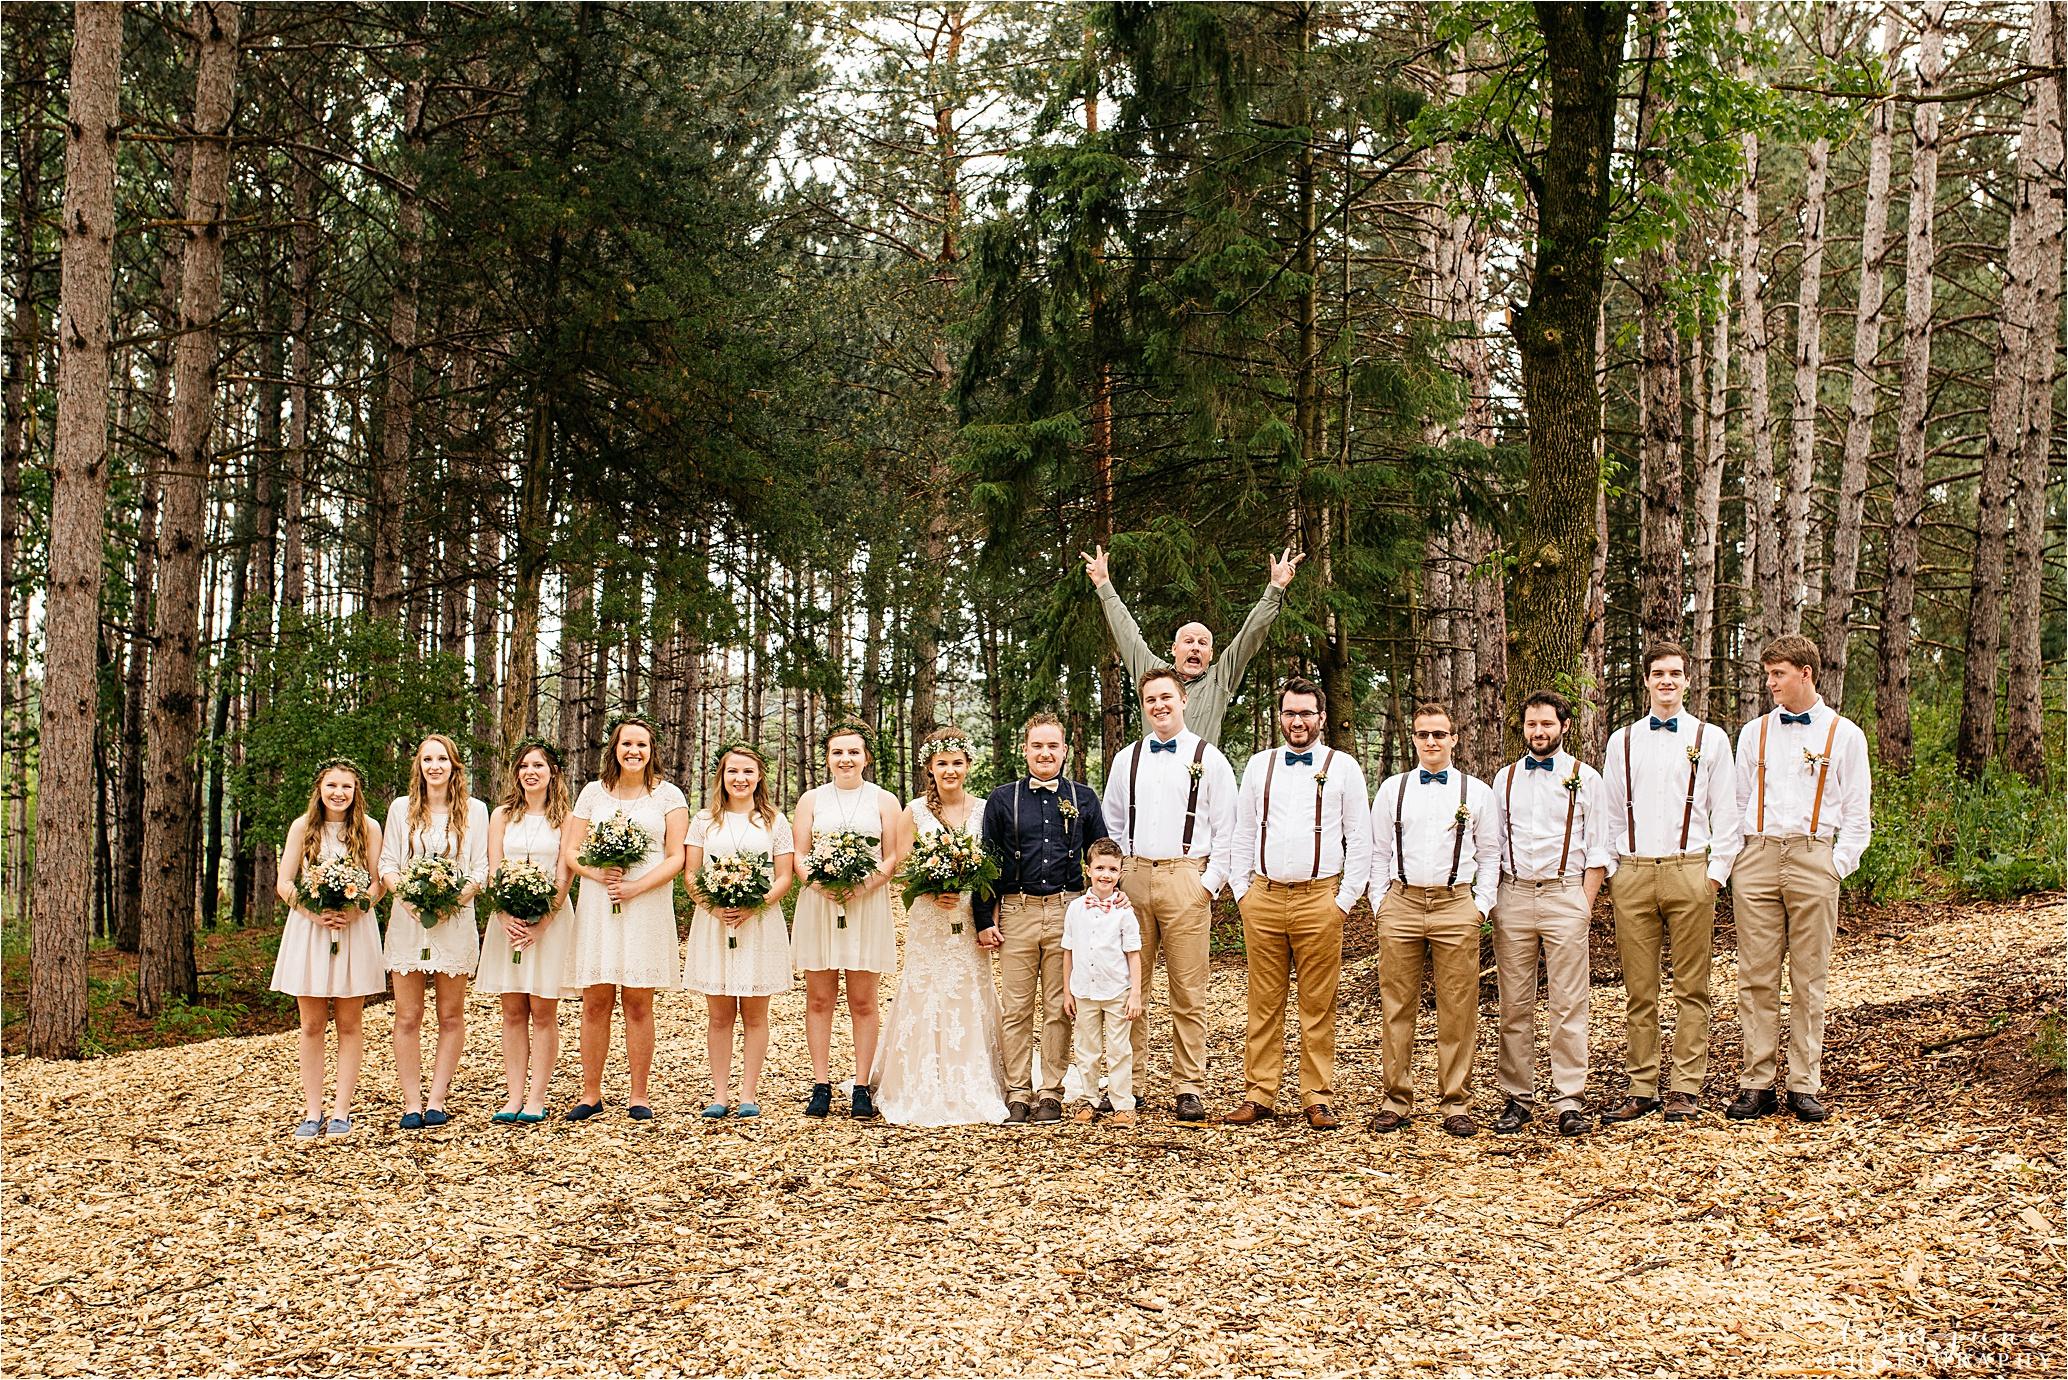 bohemian-forest-wedding-stillwater-minnesota-flower-crown-st-cloud-photographer-bridal-party